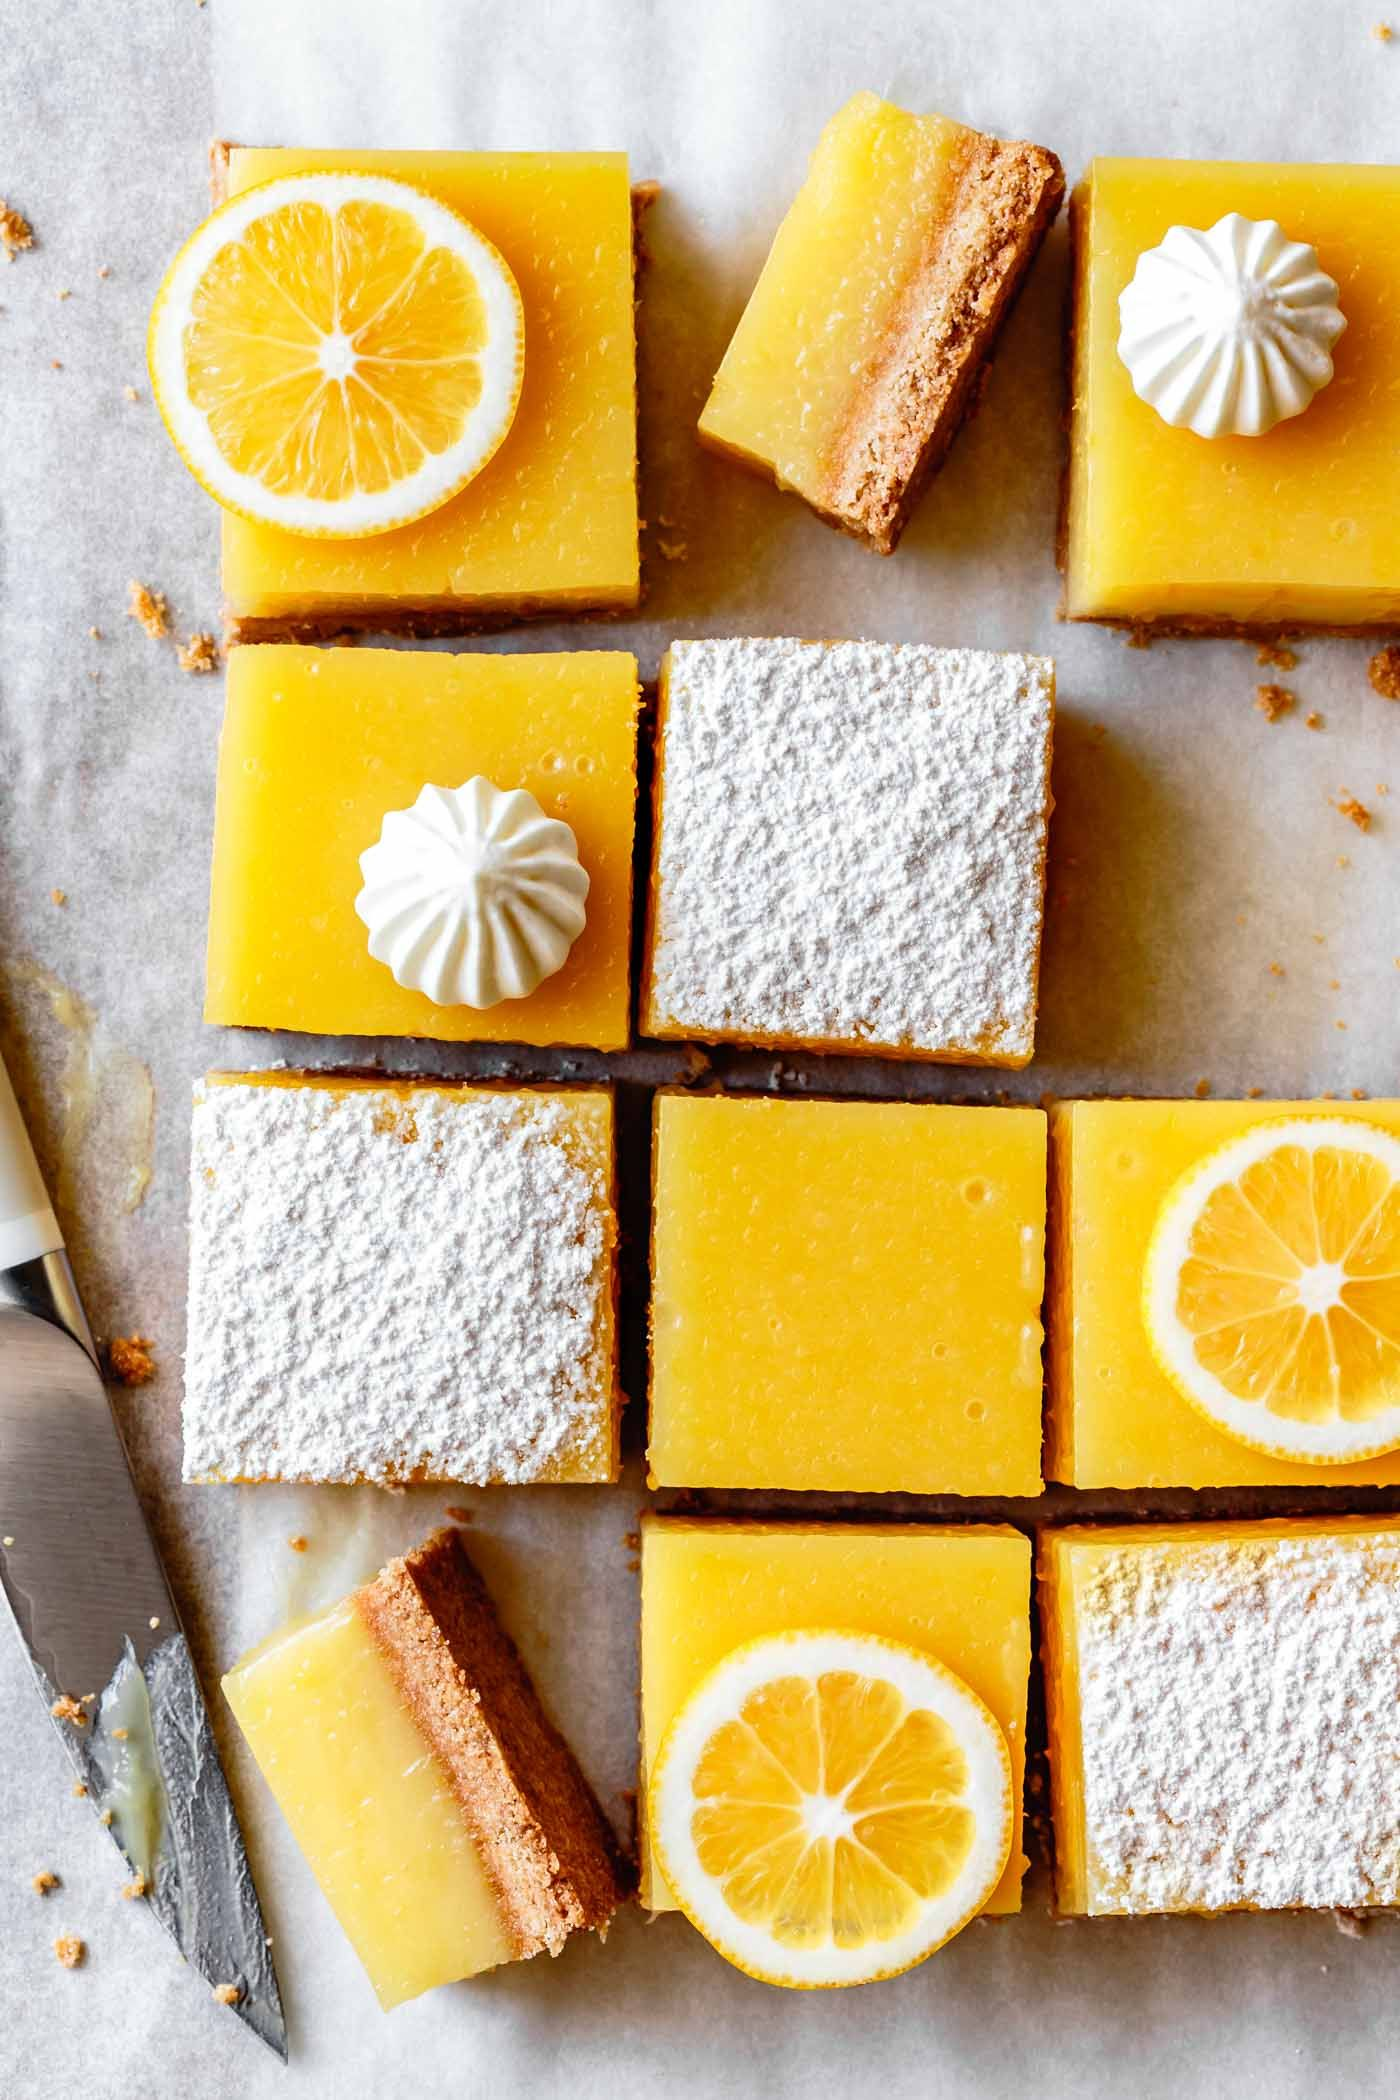 Gluten-Free Lemon Bars | With creamy, tangy lemon curd and a salty-sweet almond flour shortbread cr